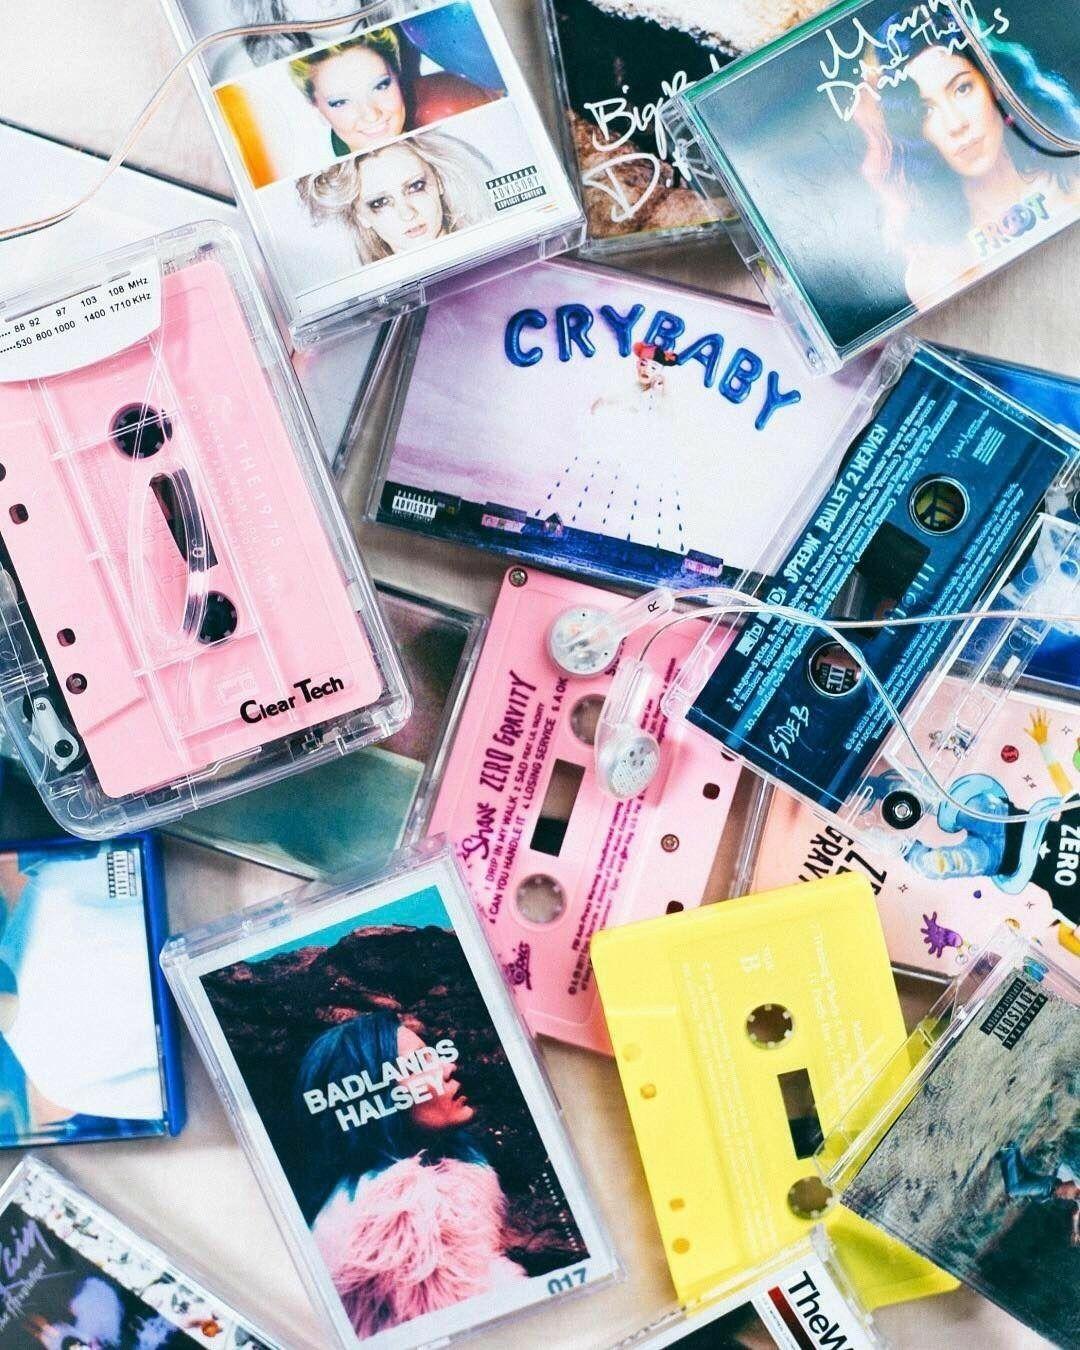 pinterest- happilyeverafters | Music aesthetic, Aesthetic ...